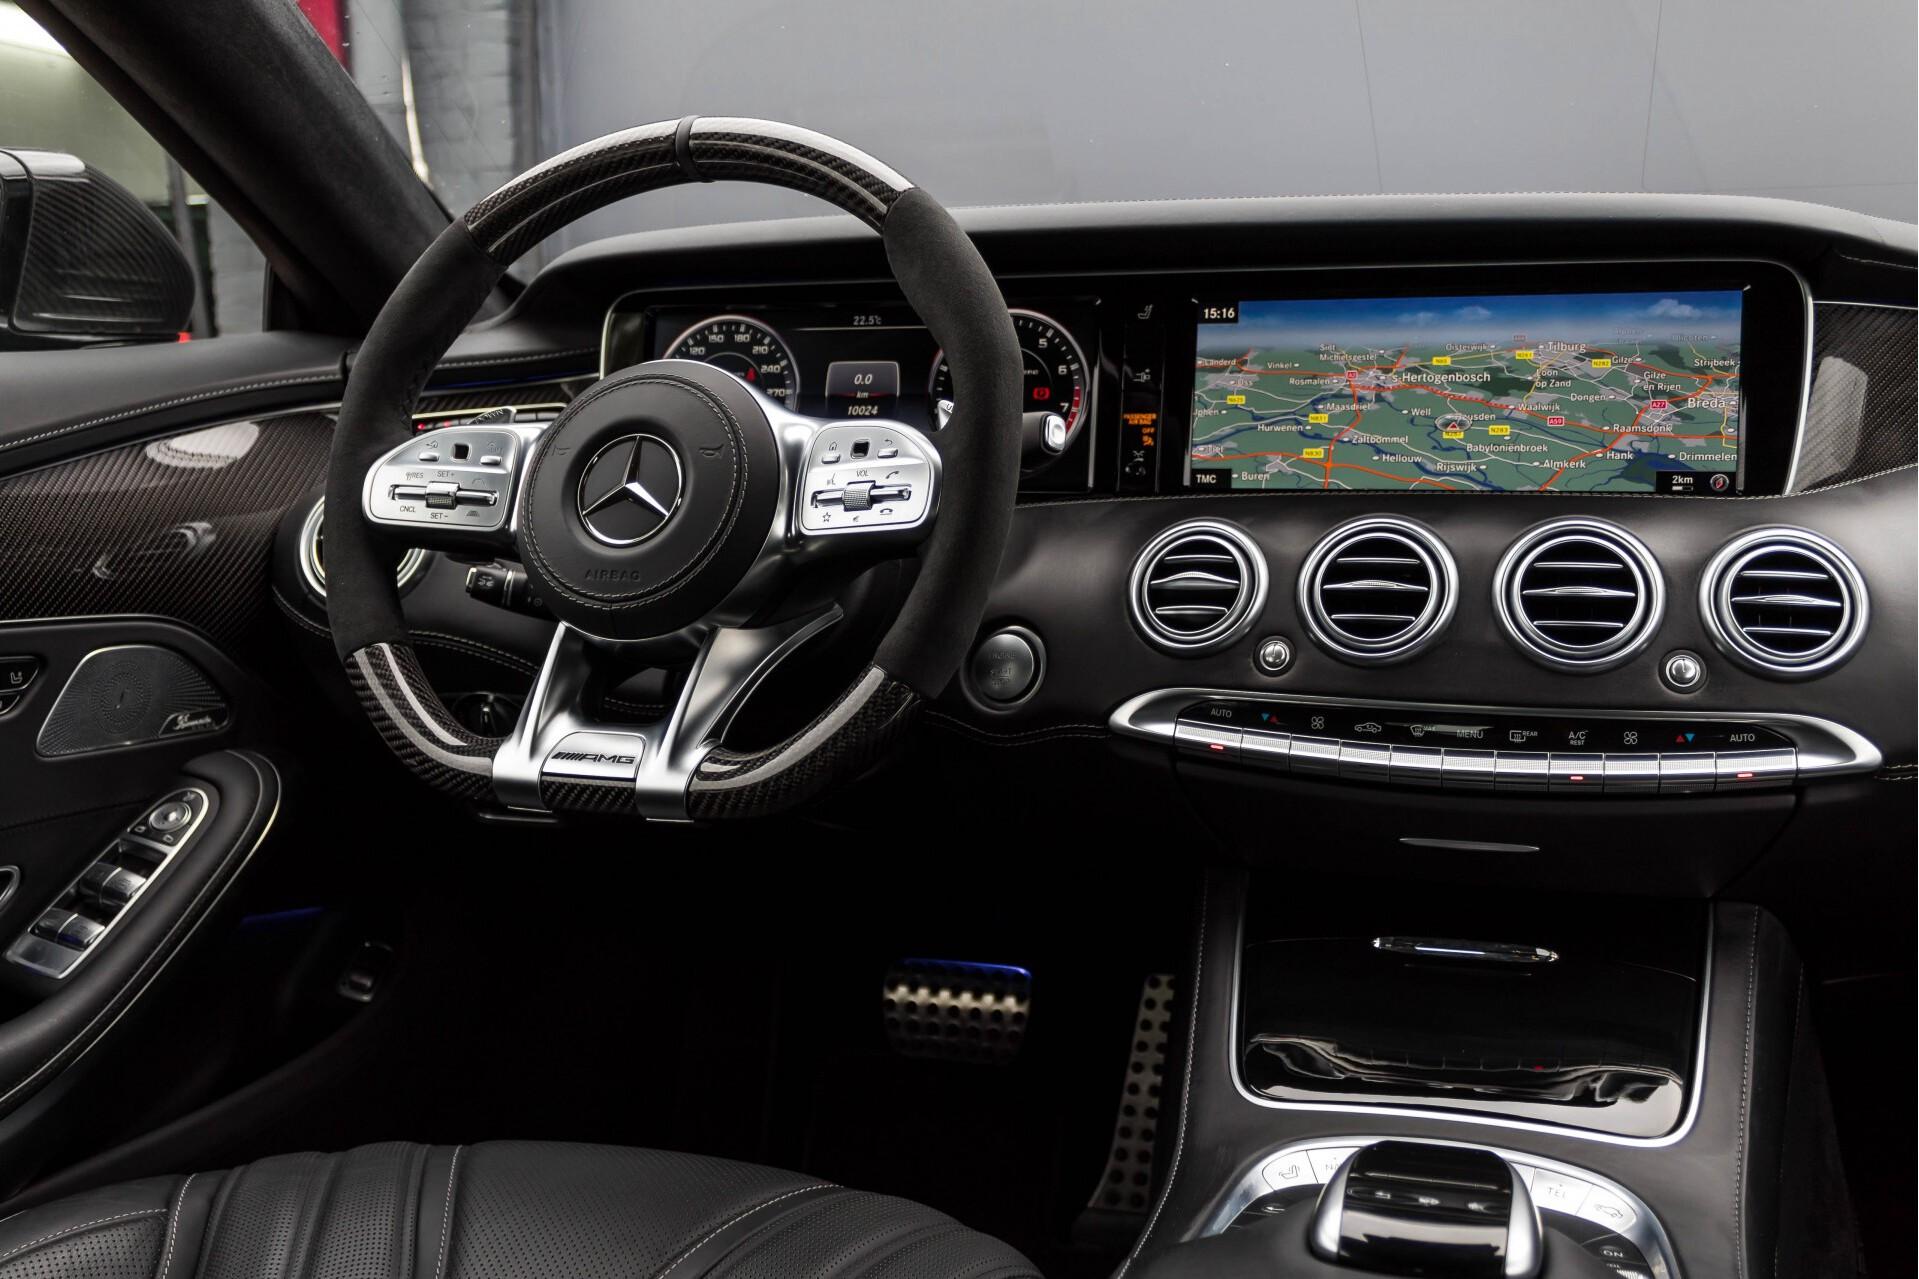 Mercedes-Benz S-Klasse Cabrio 63 AMG 4-M Ceramic/Designo/Carbon/Burmester High End Aut Foto 8